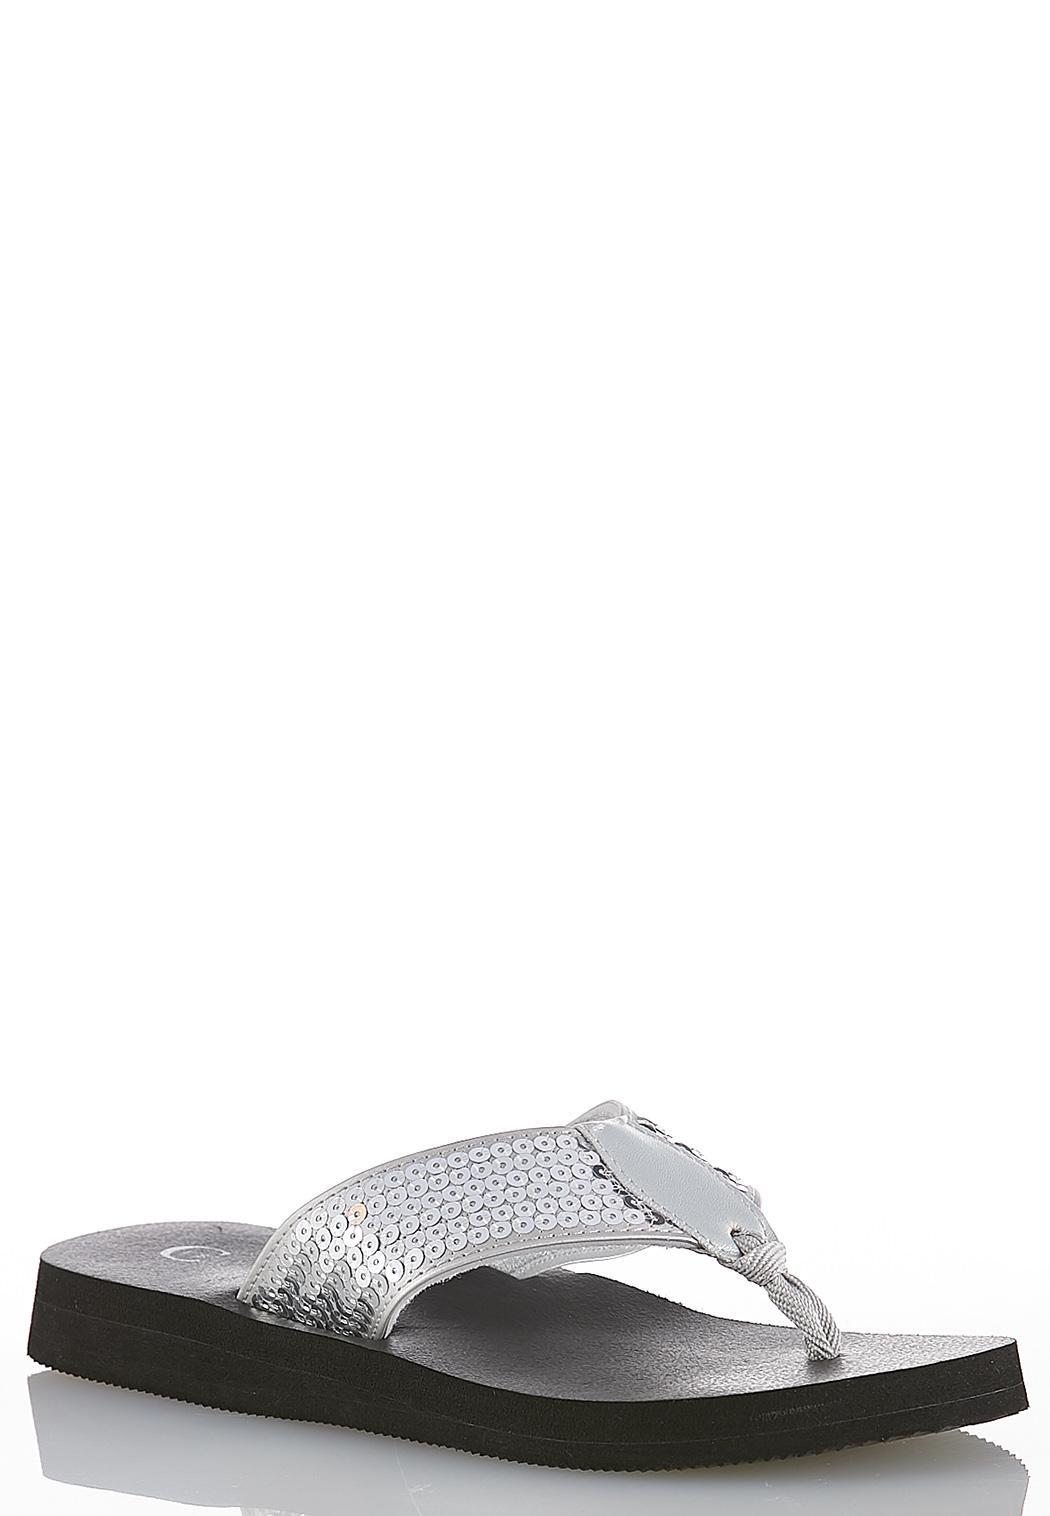 cdd1f958c92 Sequin Platform Flip Flops Sandals Cato Fashions